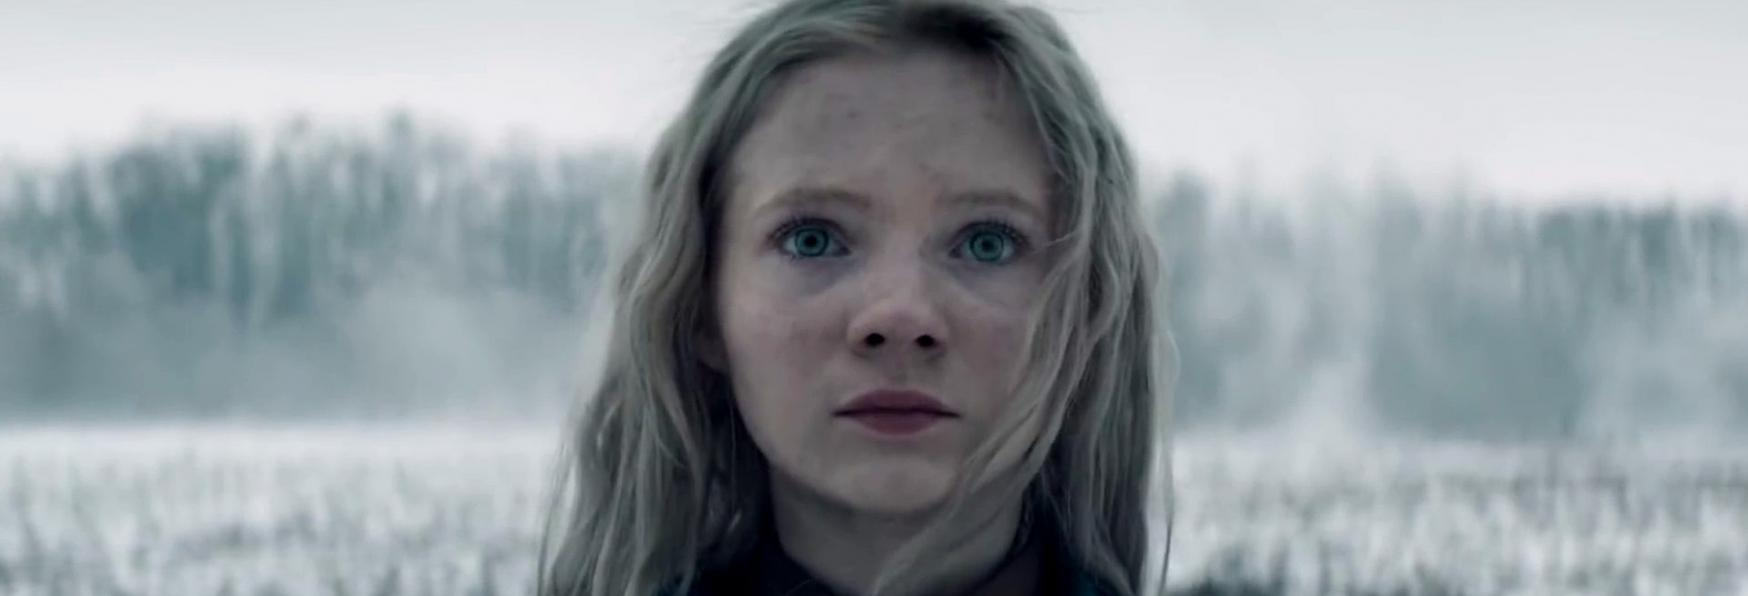 The Witcher: Netflix fa bingo - Recensione 5